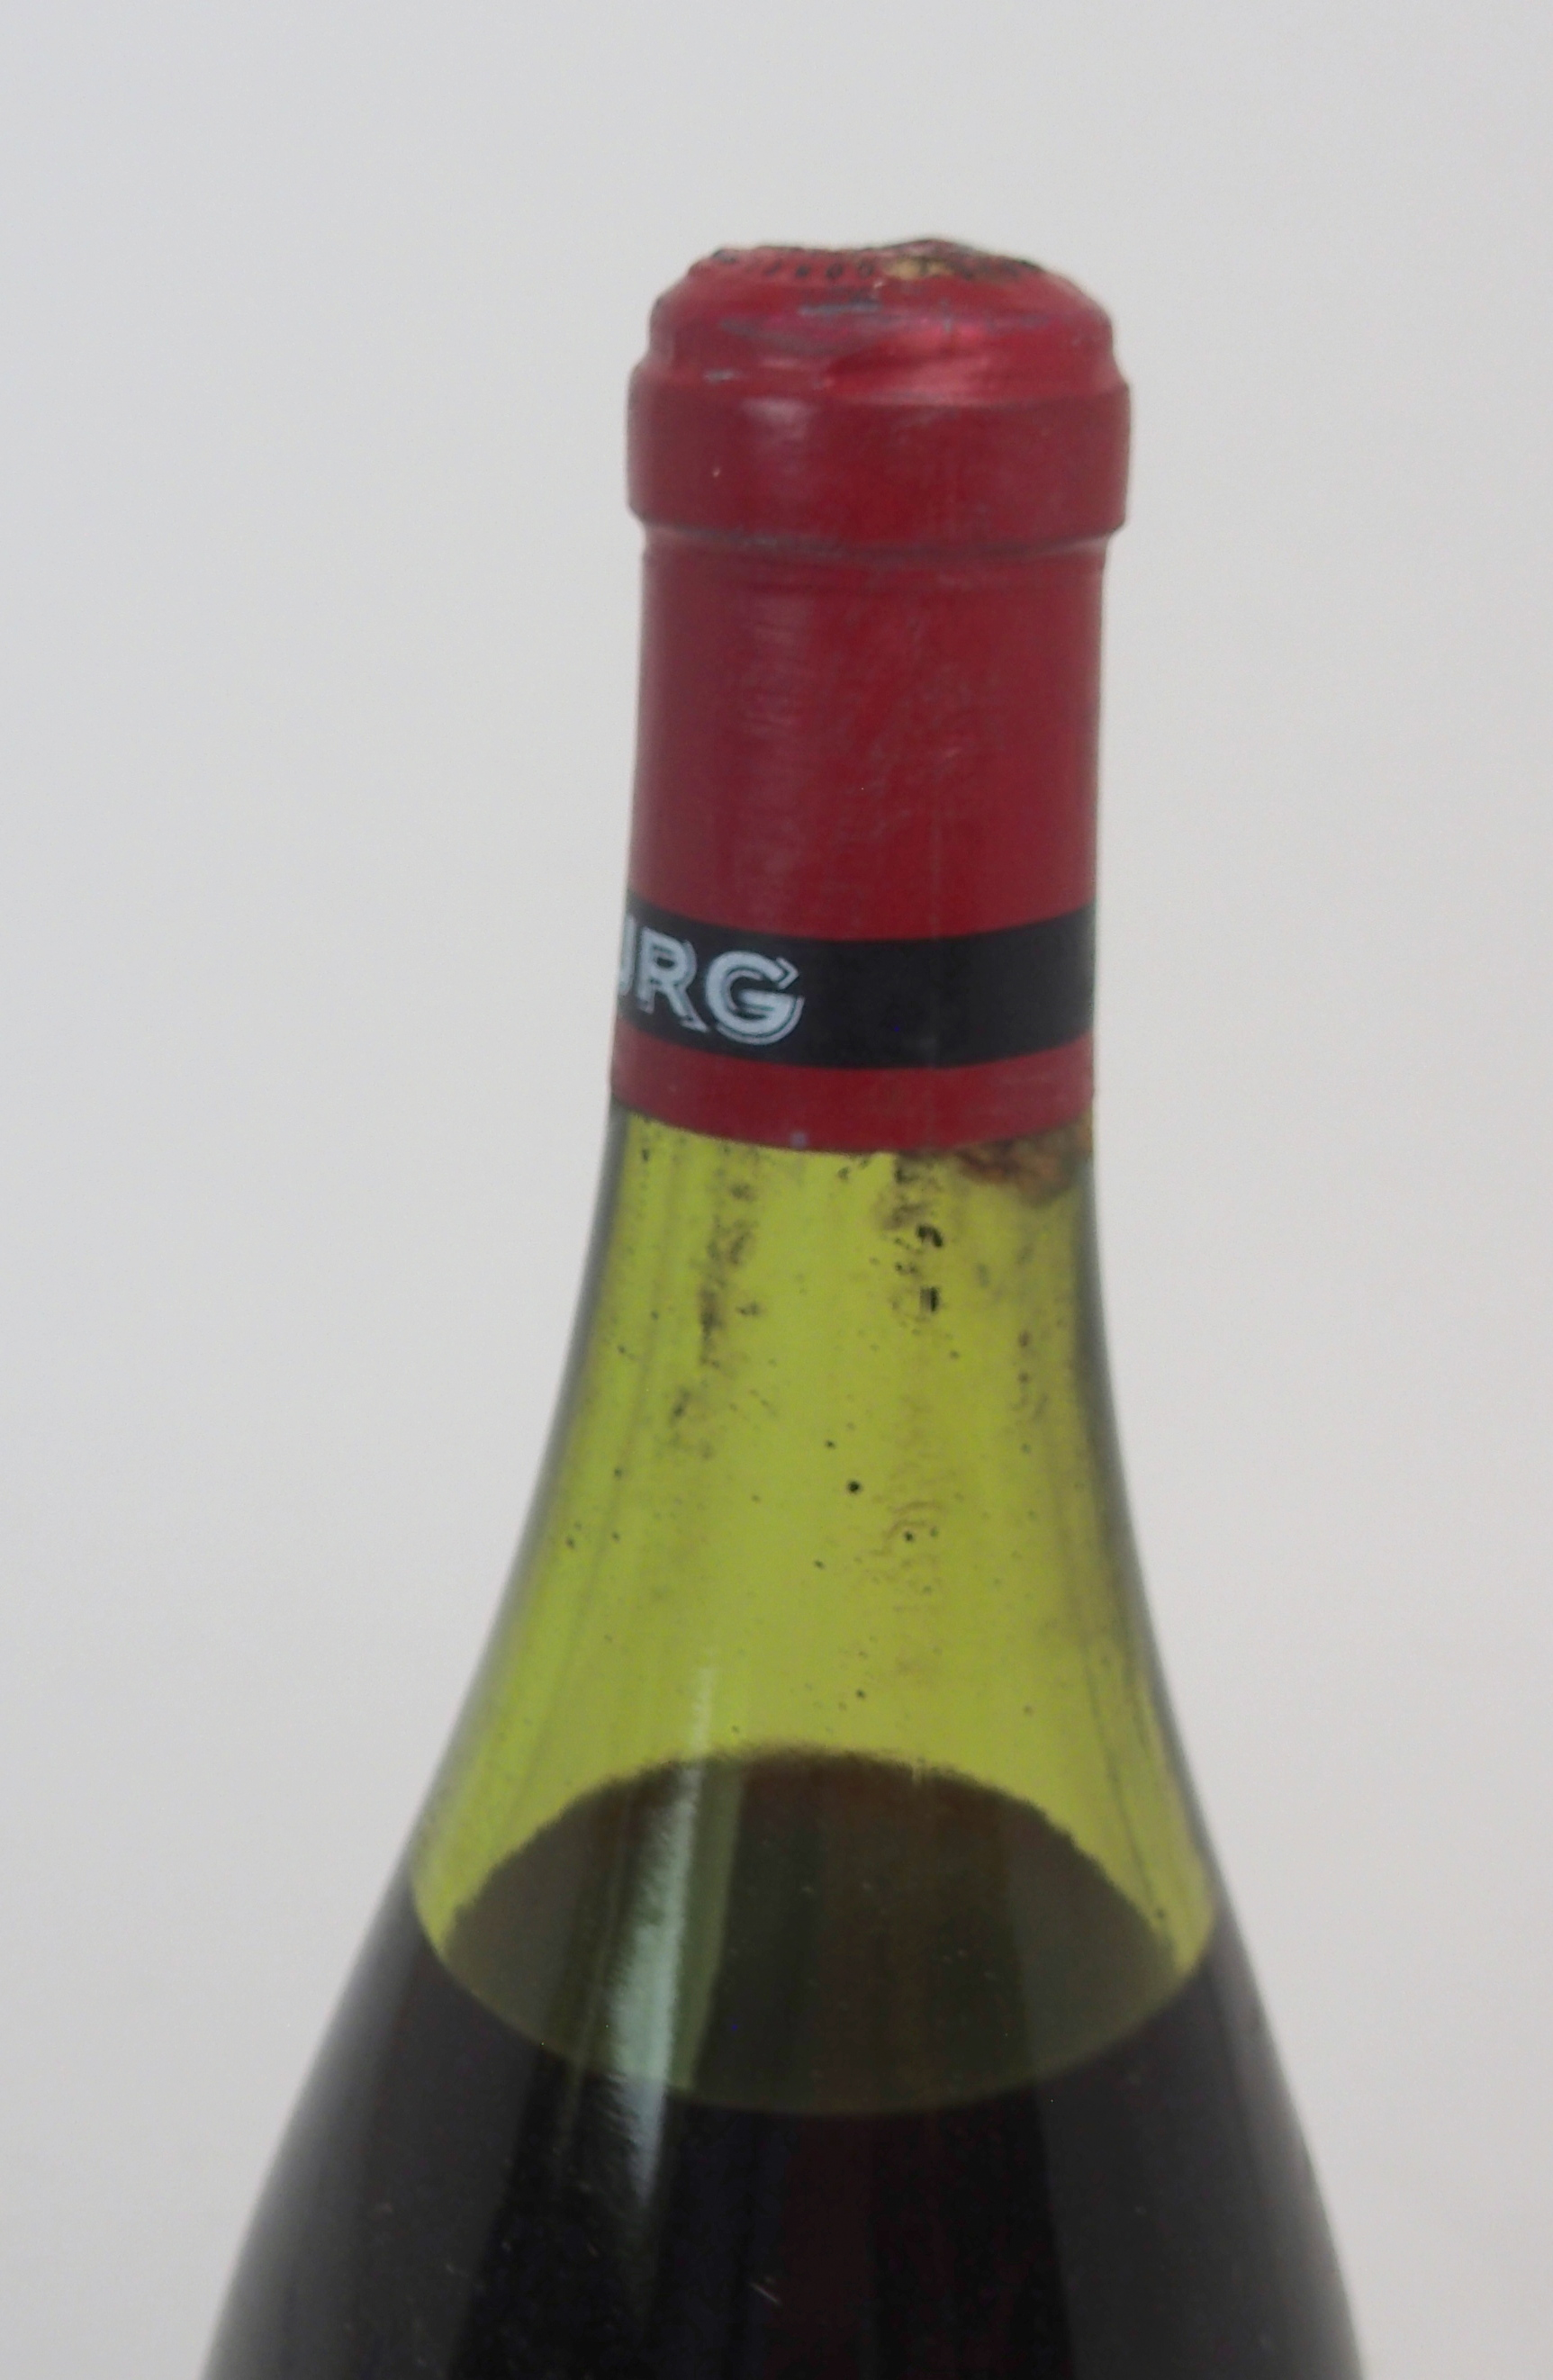 A MAGNUM OF RICHBOURG DOMAINE DE LA ROMANEE-CONTI Bottle No.000410, 1969 Condition Report: Available - Image 5 of 6